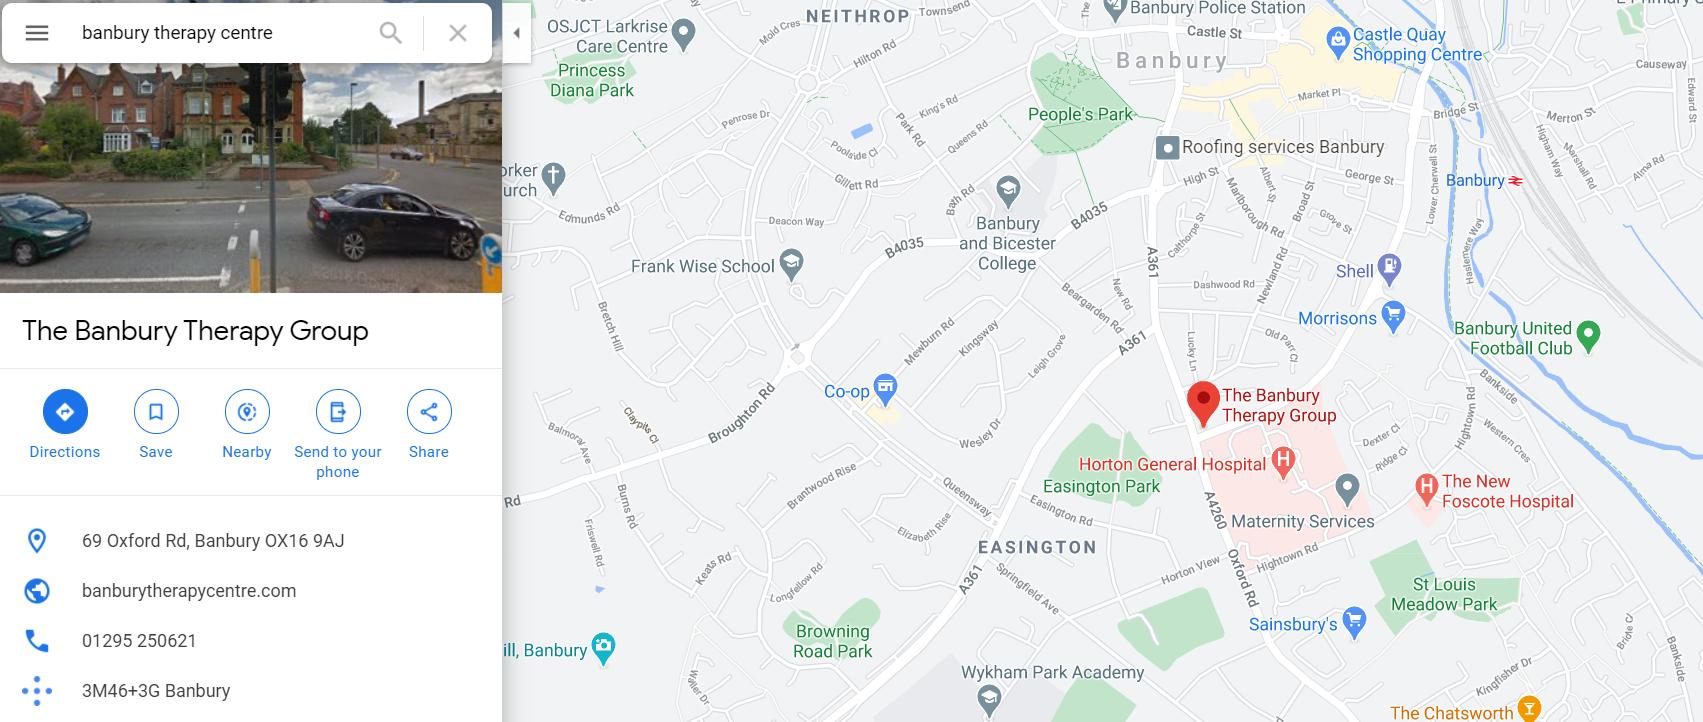 banbury-therapy-centre-google-maps